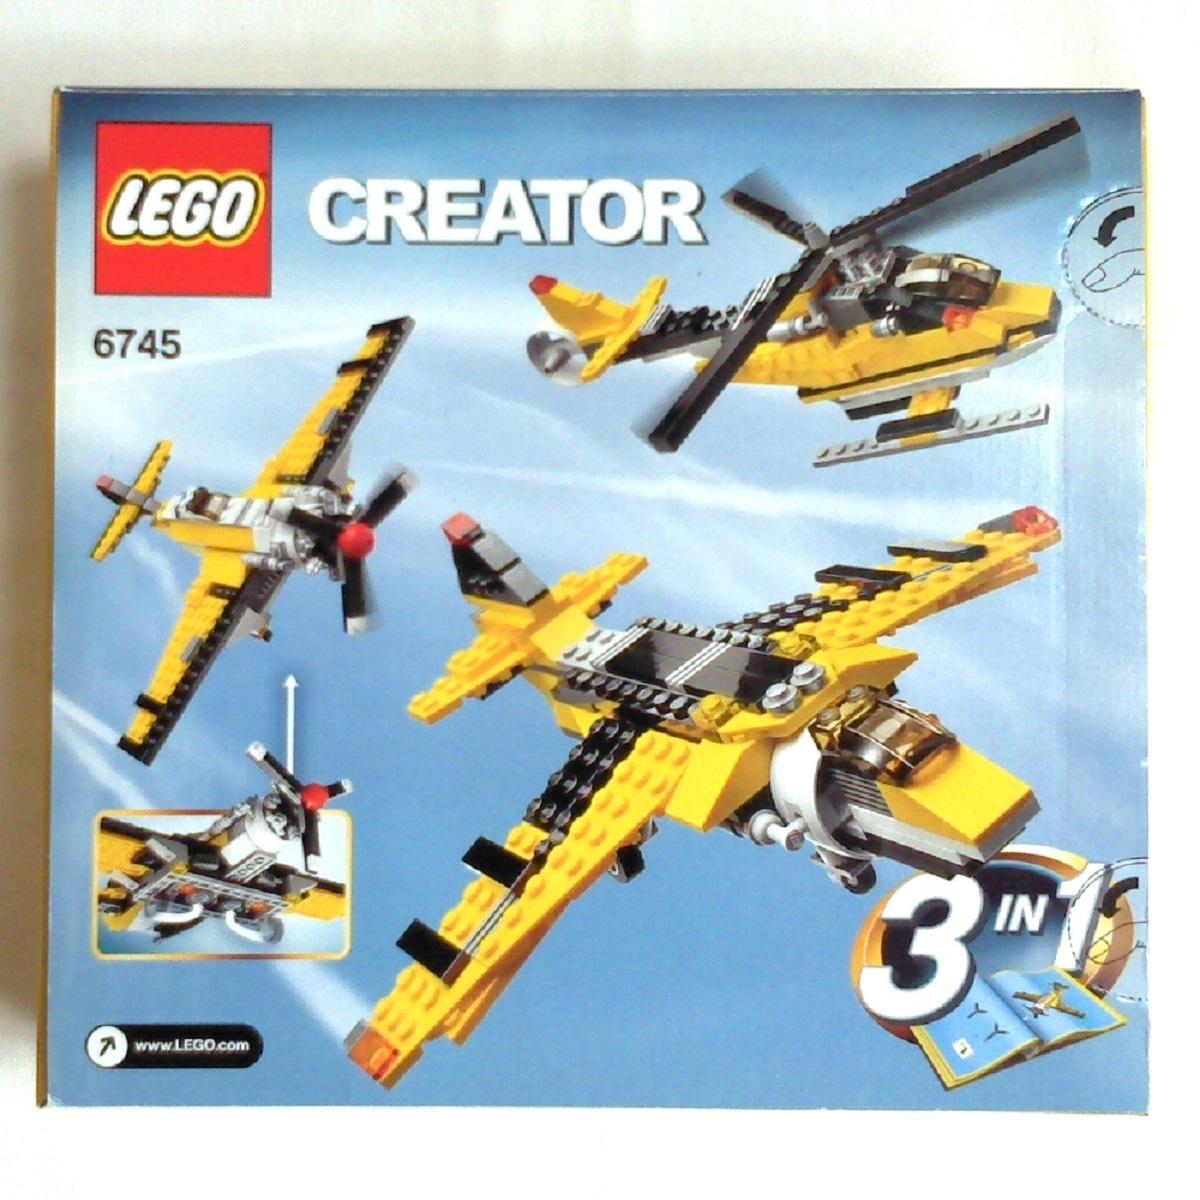 LEGO CREATOR 6745 PROPELLER POWER 3IN1 レゴ クリエイター プロペラパワー_画像2